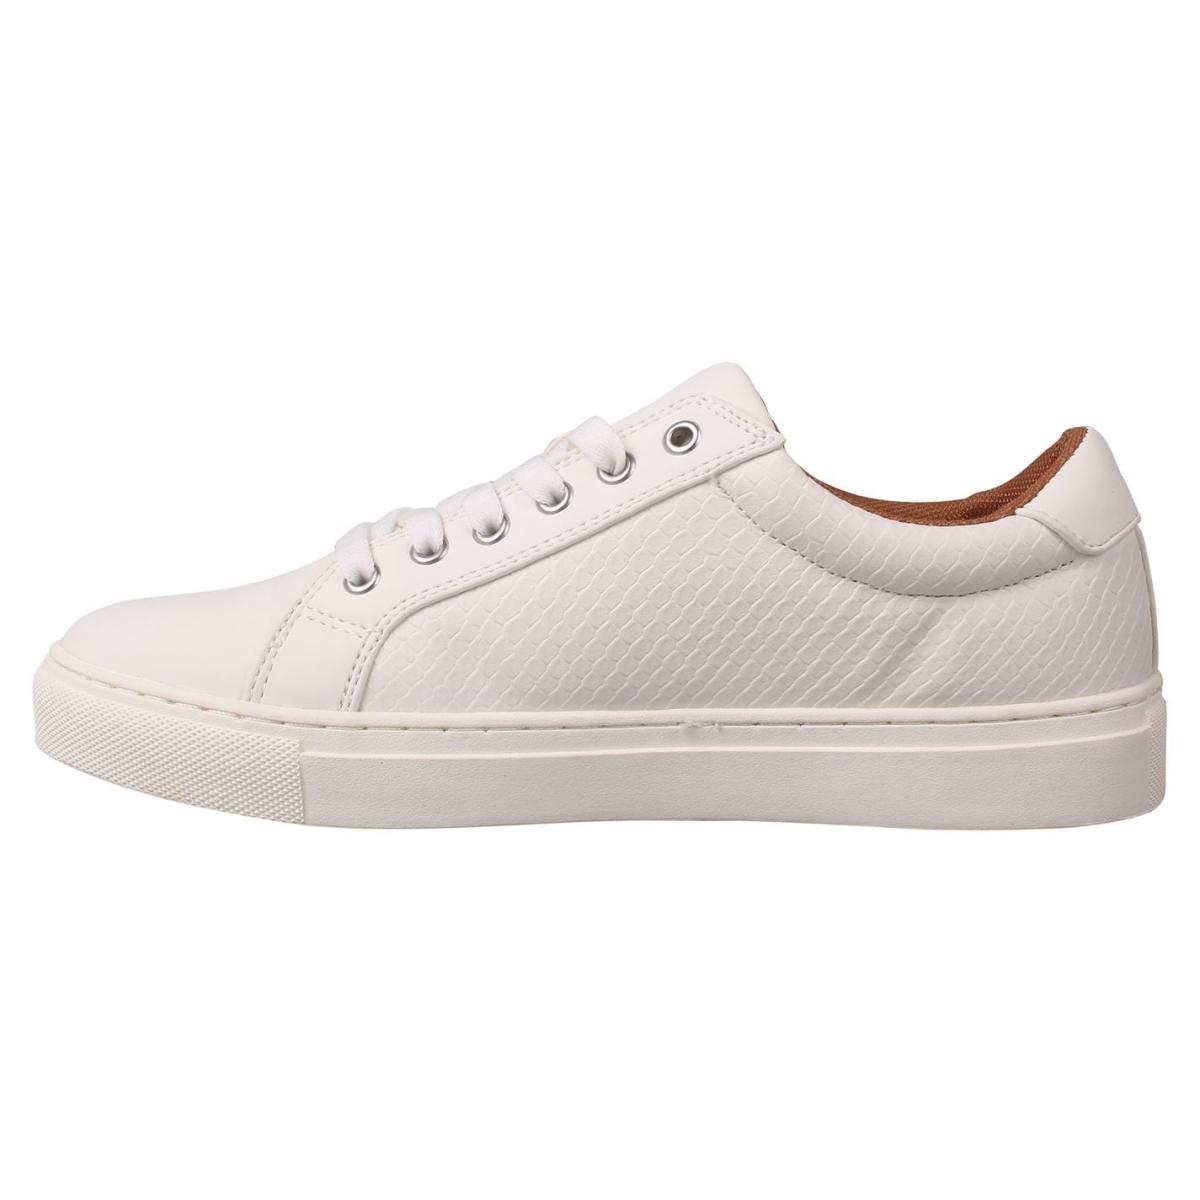 Fabric-Aruna-Lace-Turnschuhe-Laufschuhe-Damen-Sportschuhe-Sneaker-4869 Indexbild 7